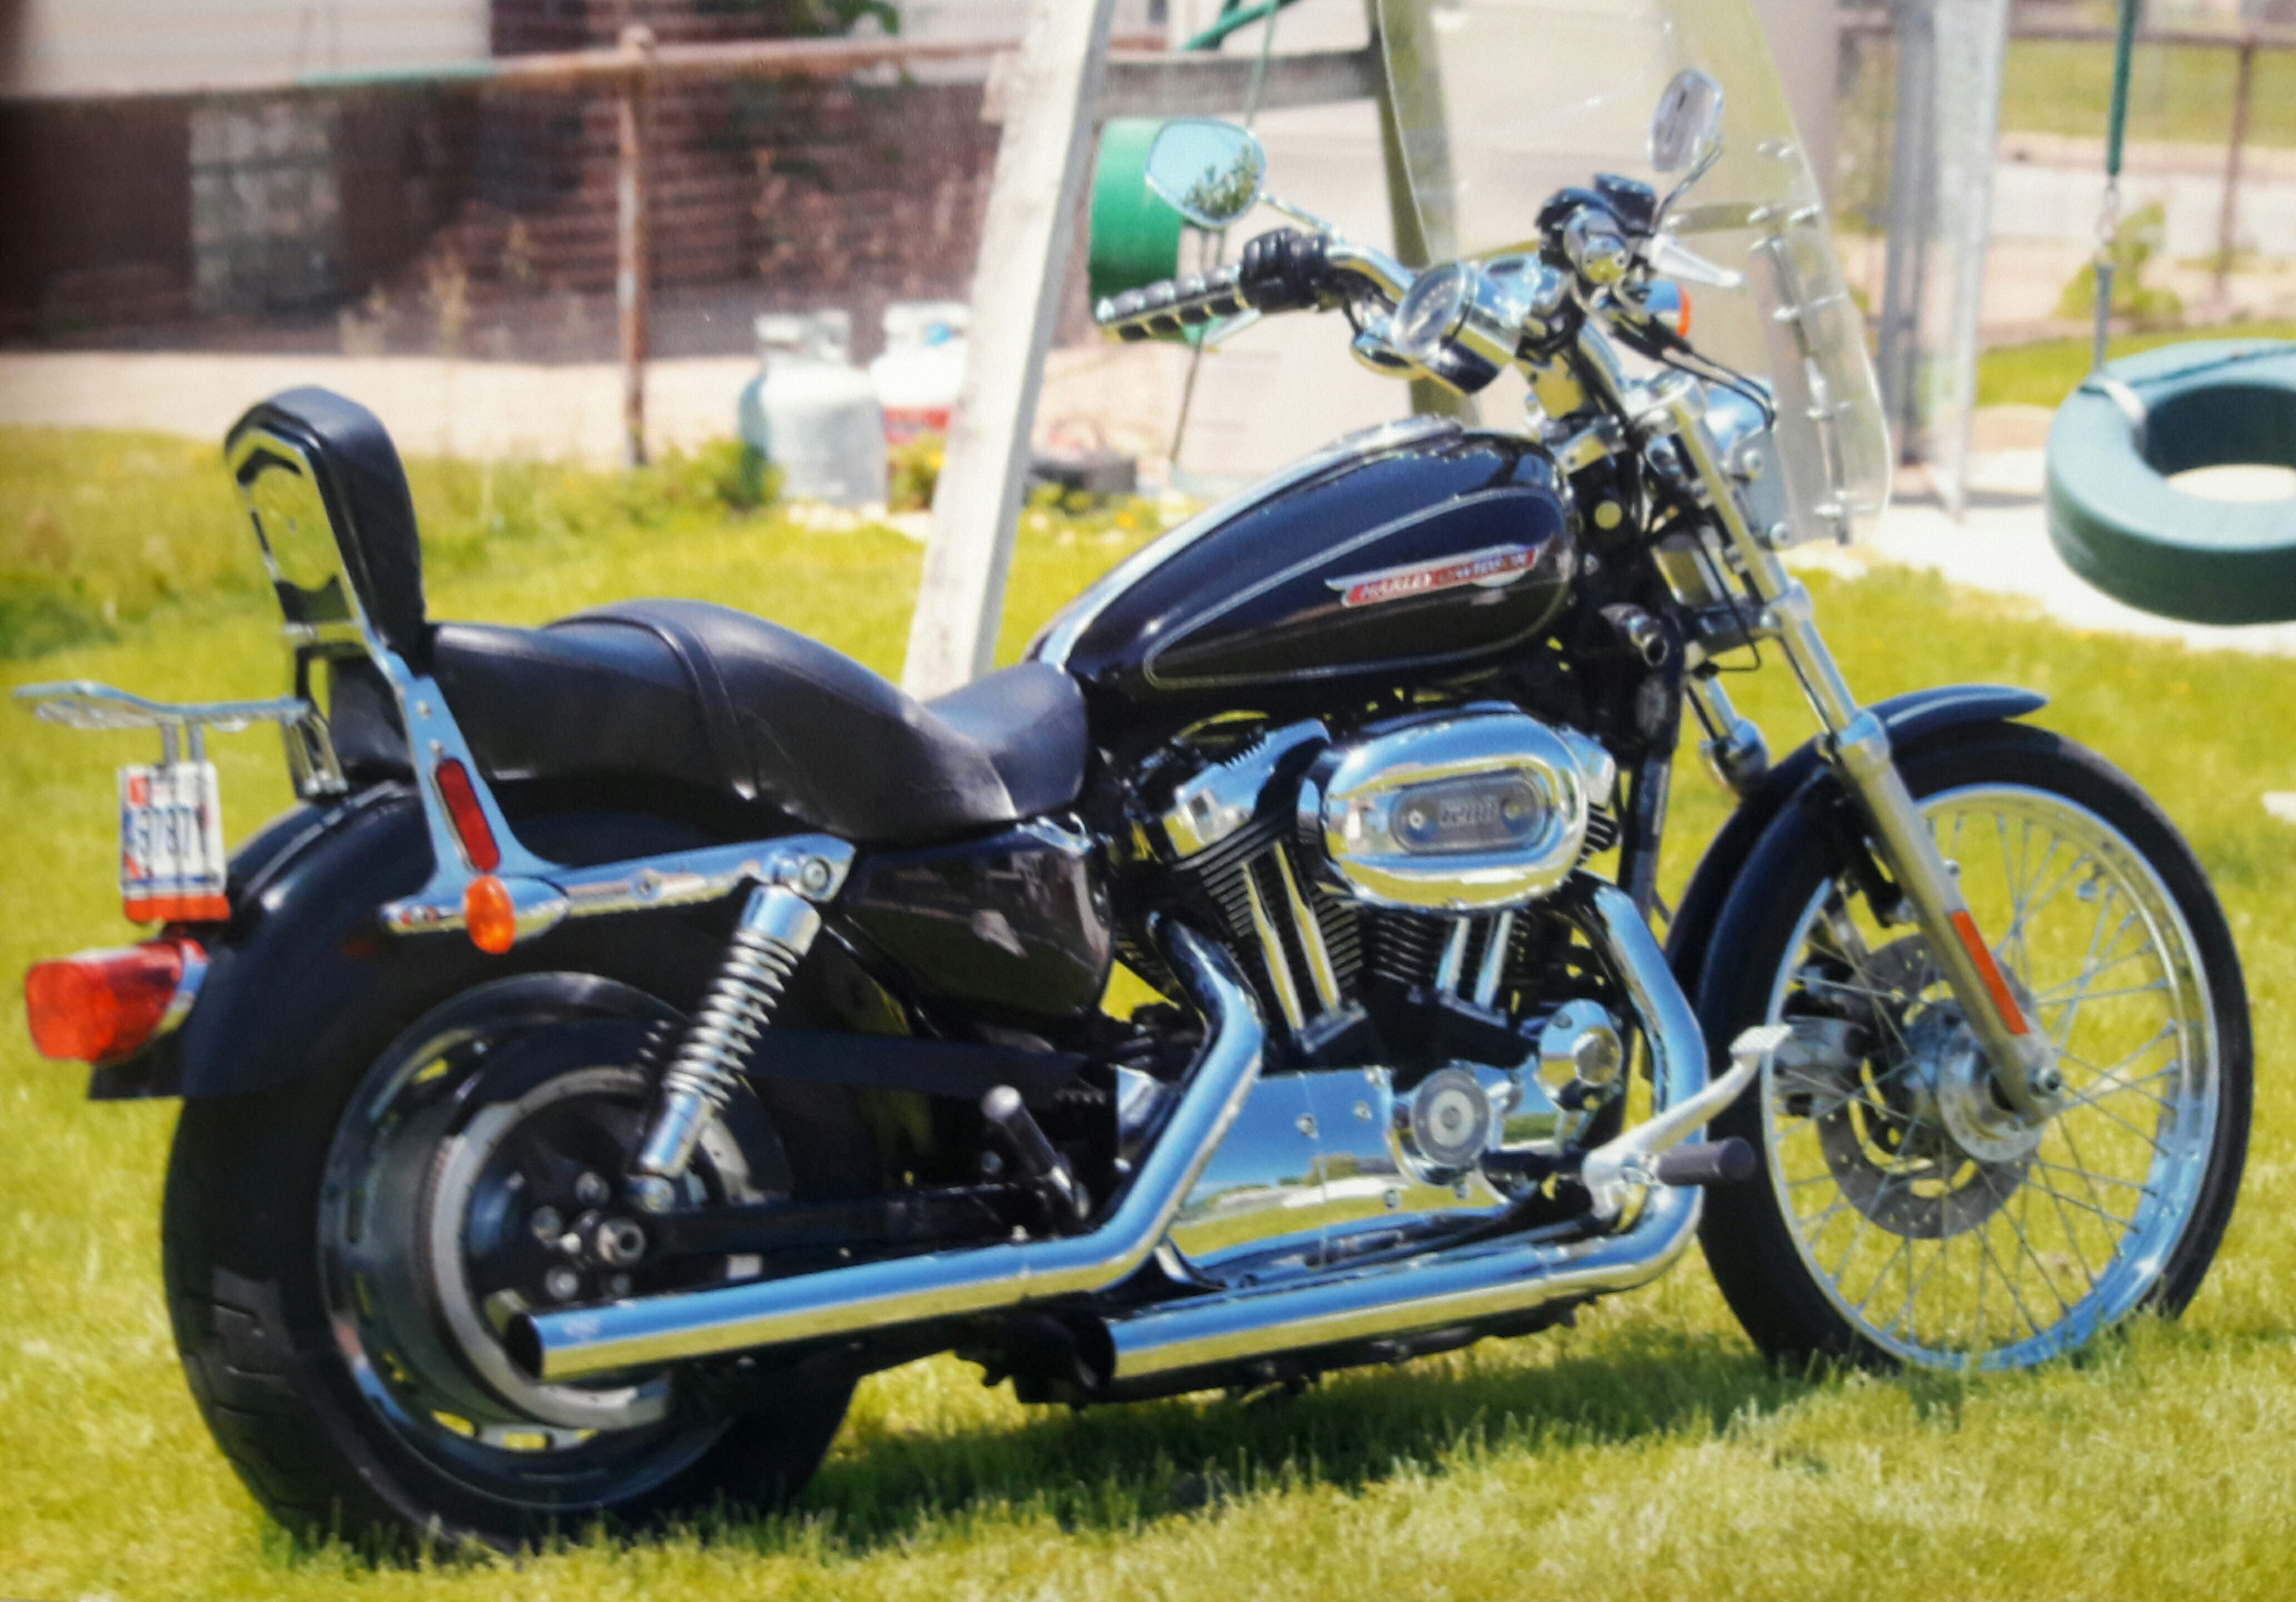 all new used harley davidson sportster 1200 1 751 bikes page 1 chopperexchange. Black Bedroom Furniture Sets. Home Design Ideas